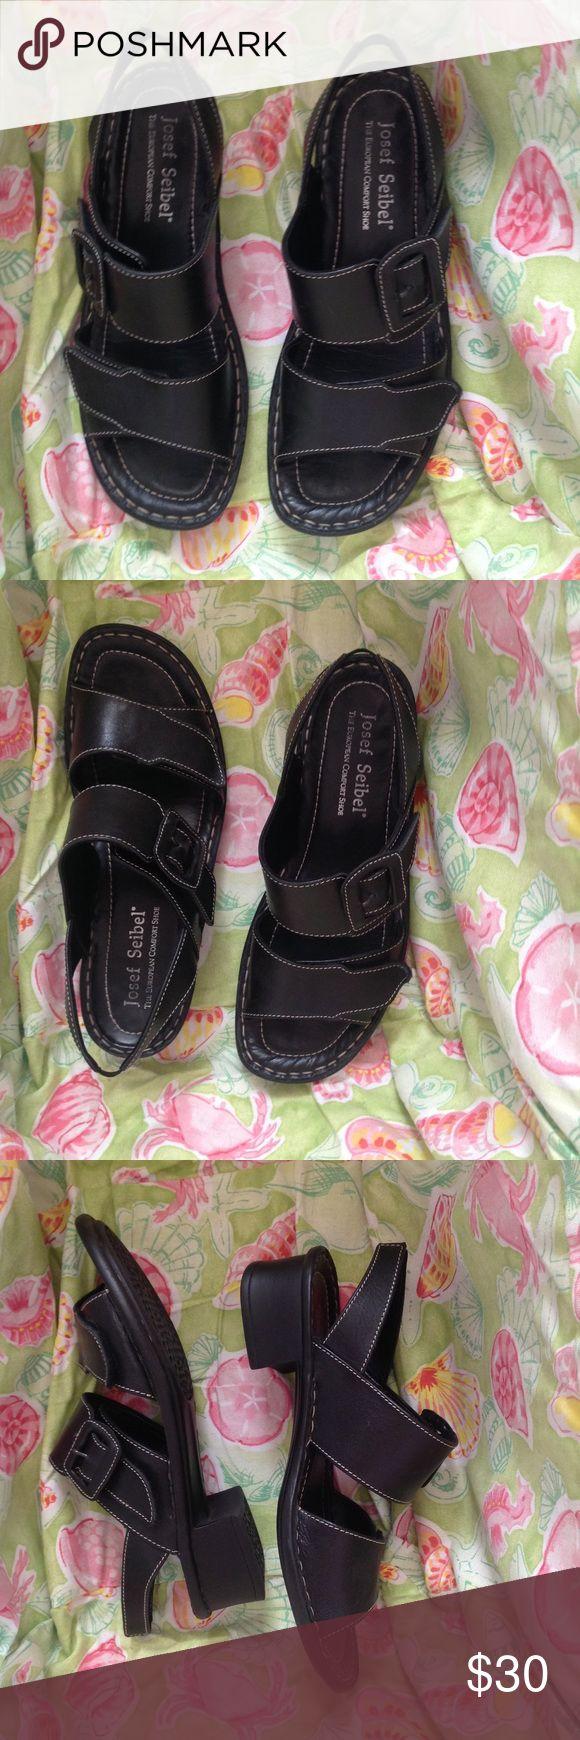 Josef Seibel sandals, size US 10/Euro 40, EUC Josef Seibel sandals, black, size US 10/Euro 40. Easy Velcro closure as shown in photo 6. Excellent condition. Josef Seibel Shoes Sandals